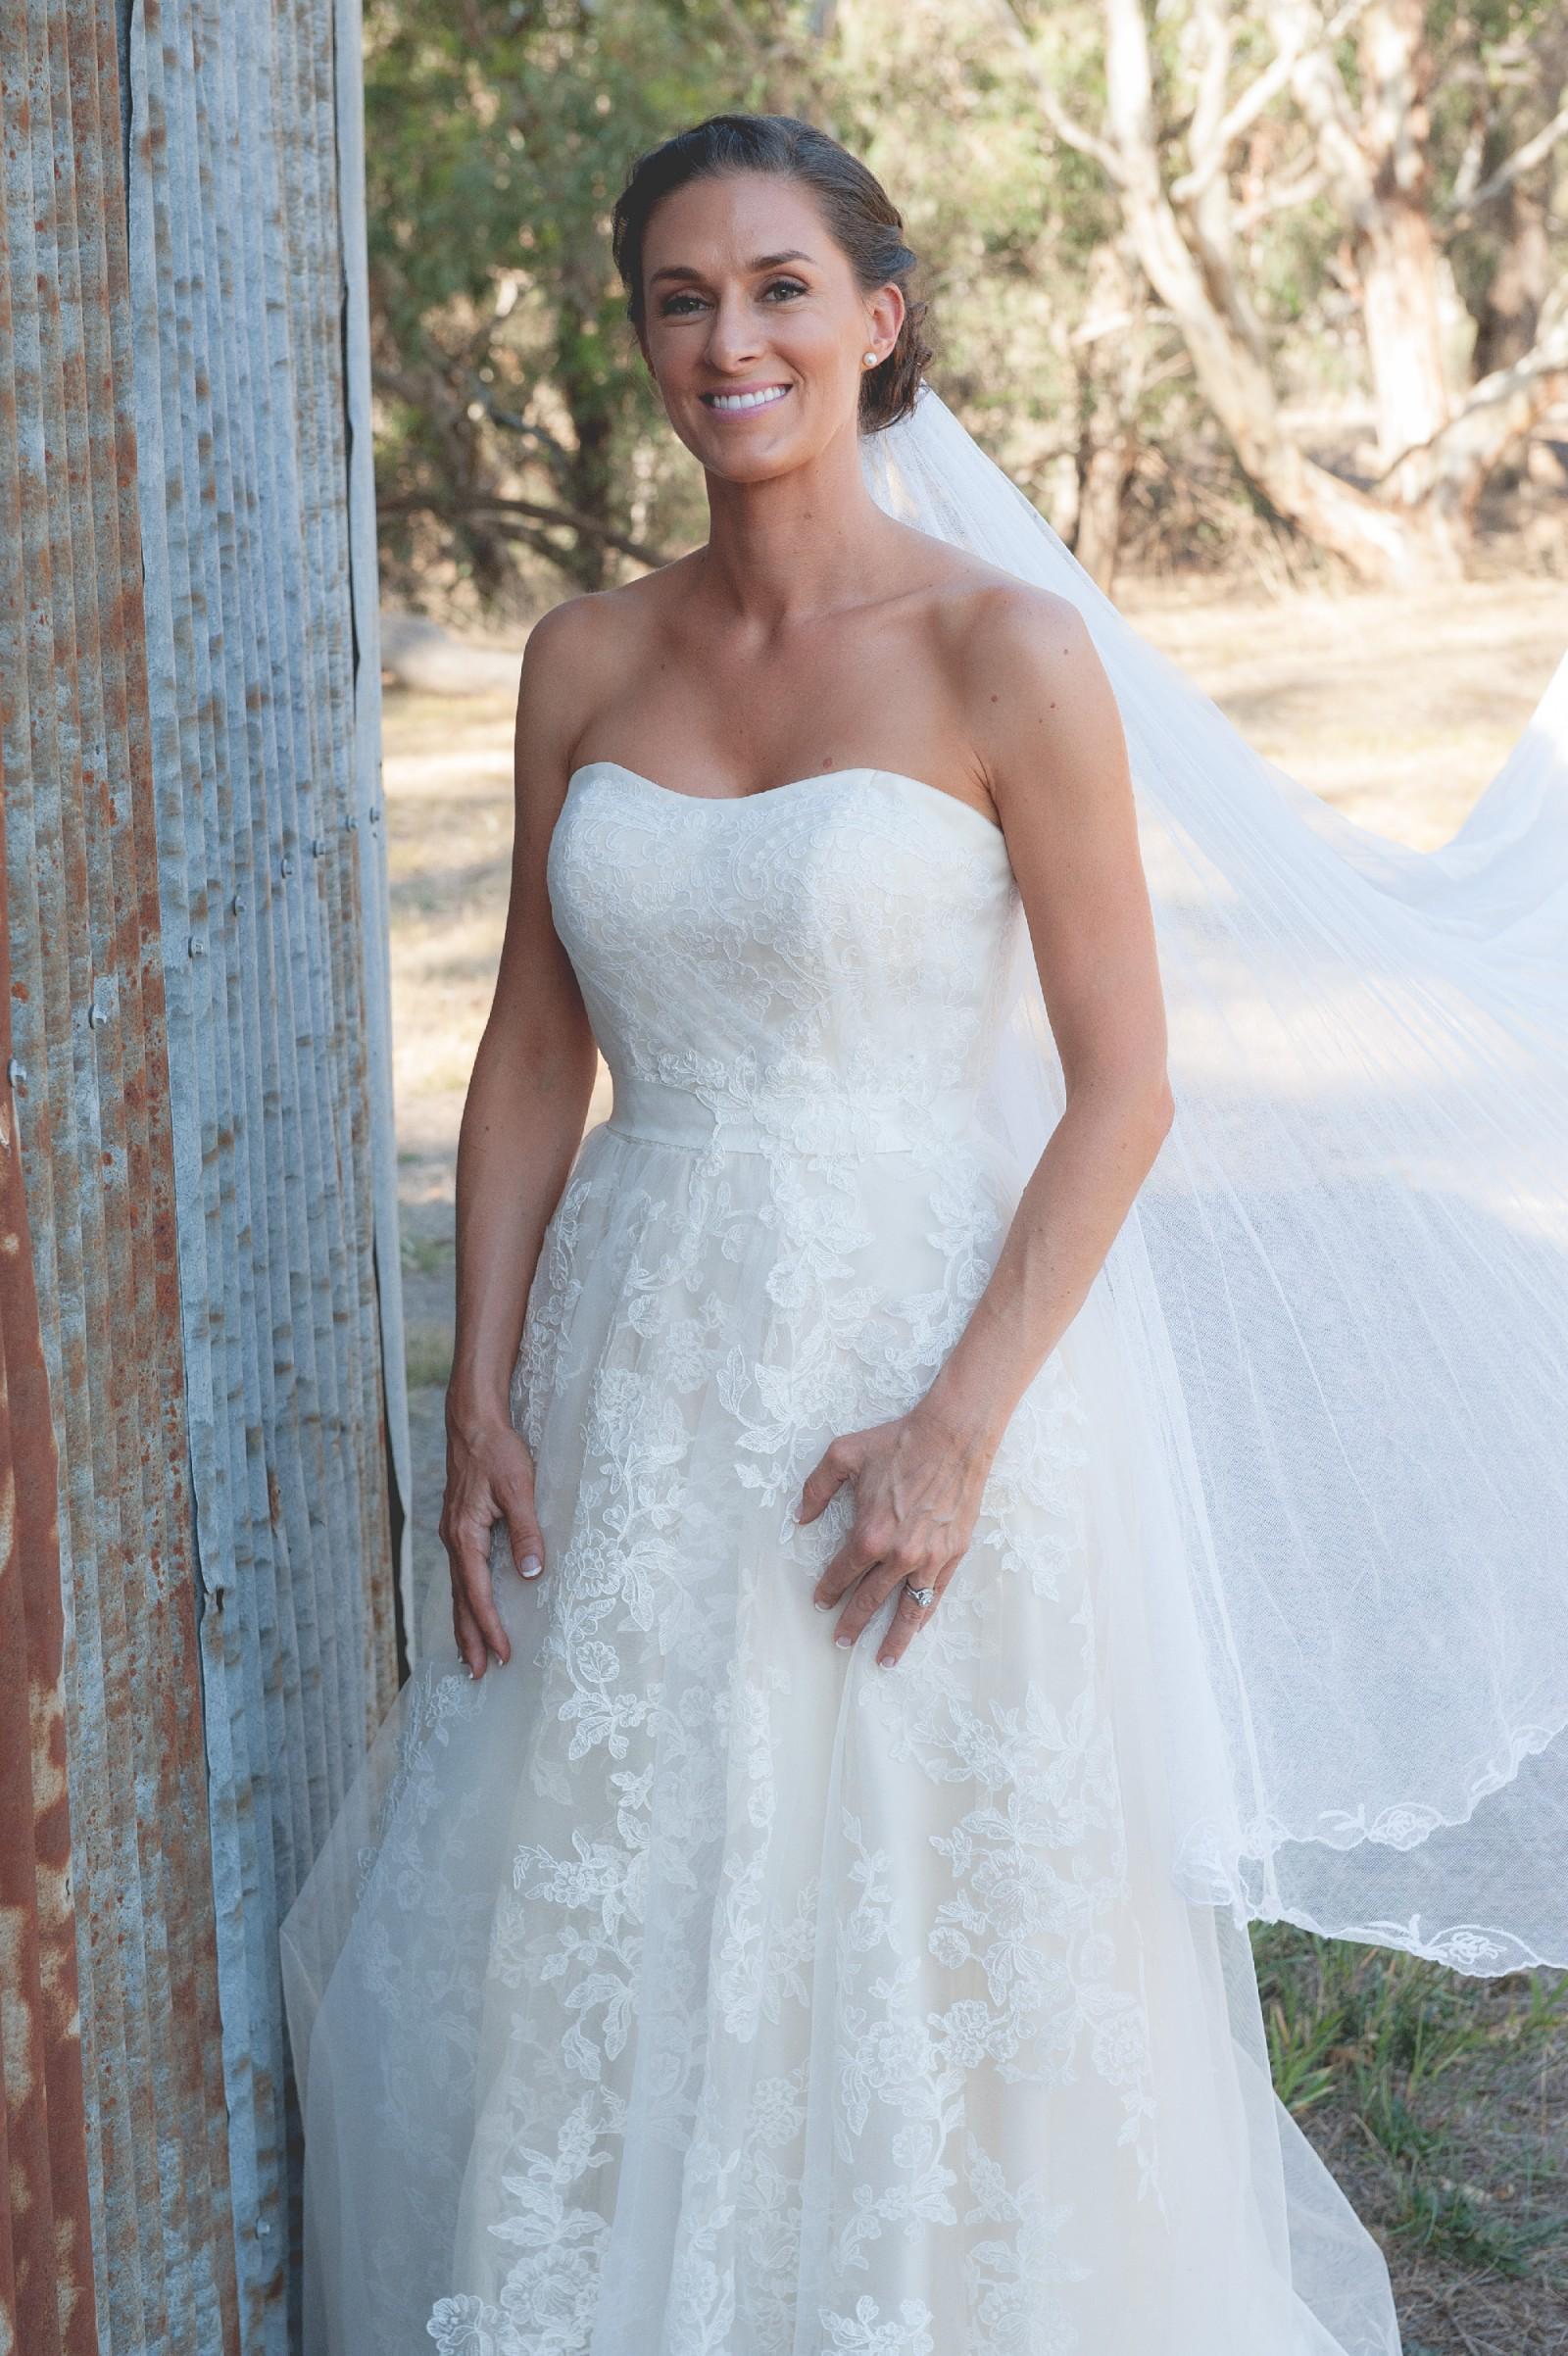 Fancy Essense Of Australia Wedding Dress Gift - All Wedding Dresses ...